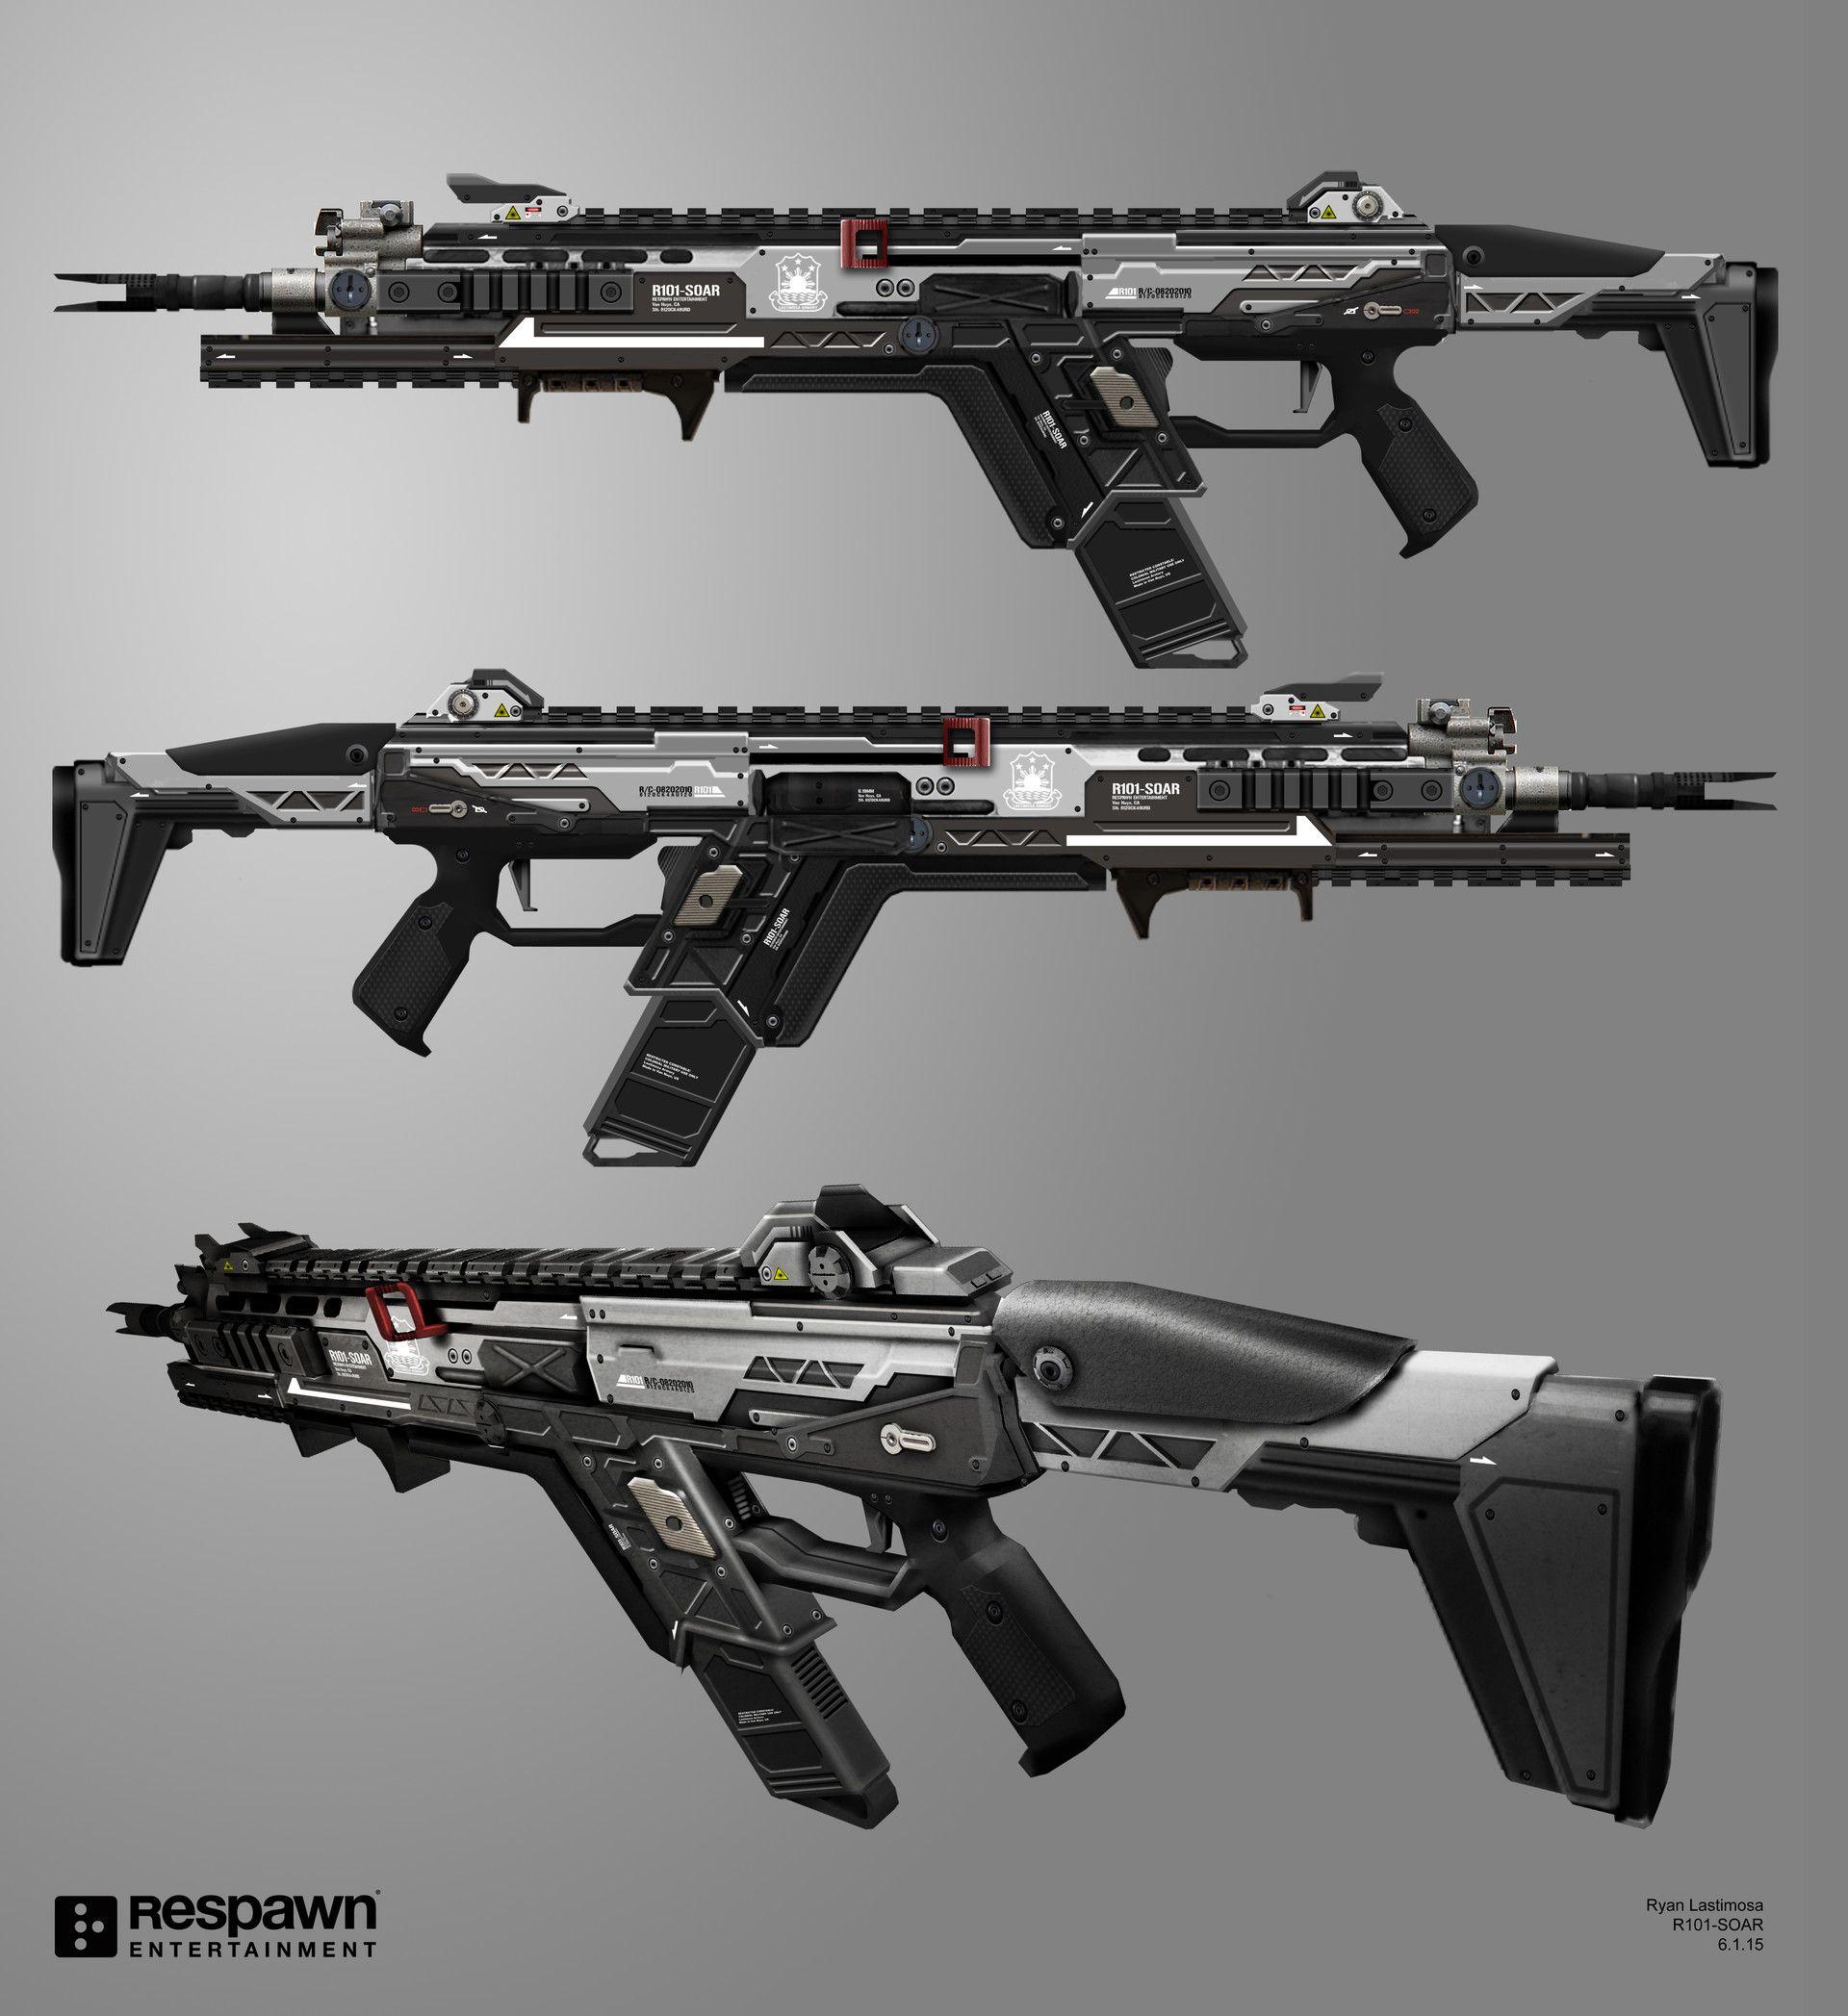 titanfall weapons minecraft mod - 736×803